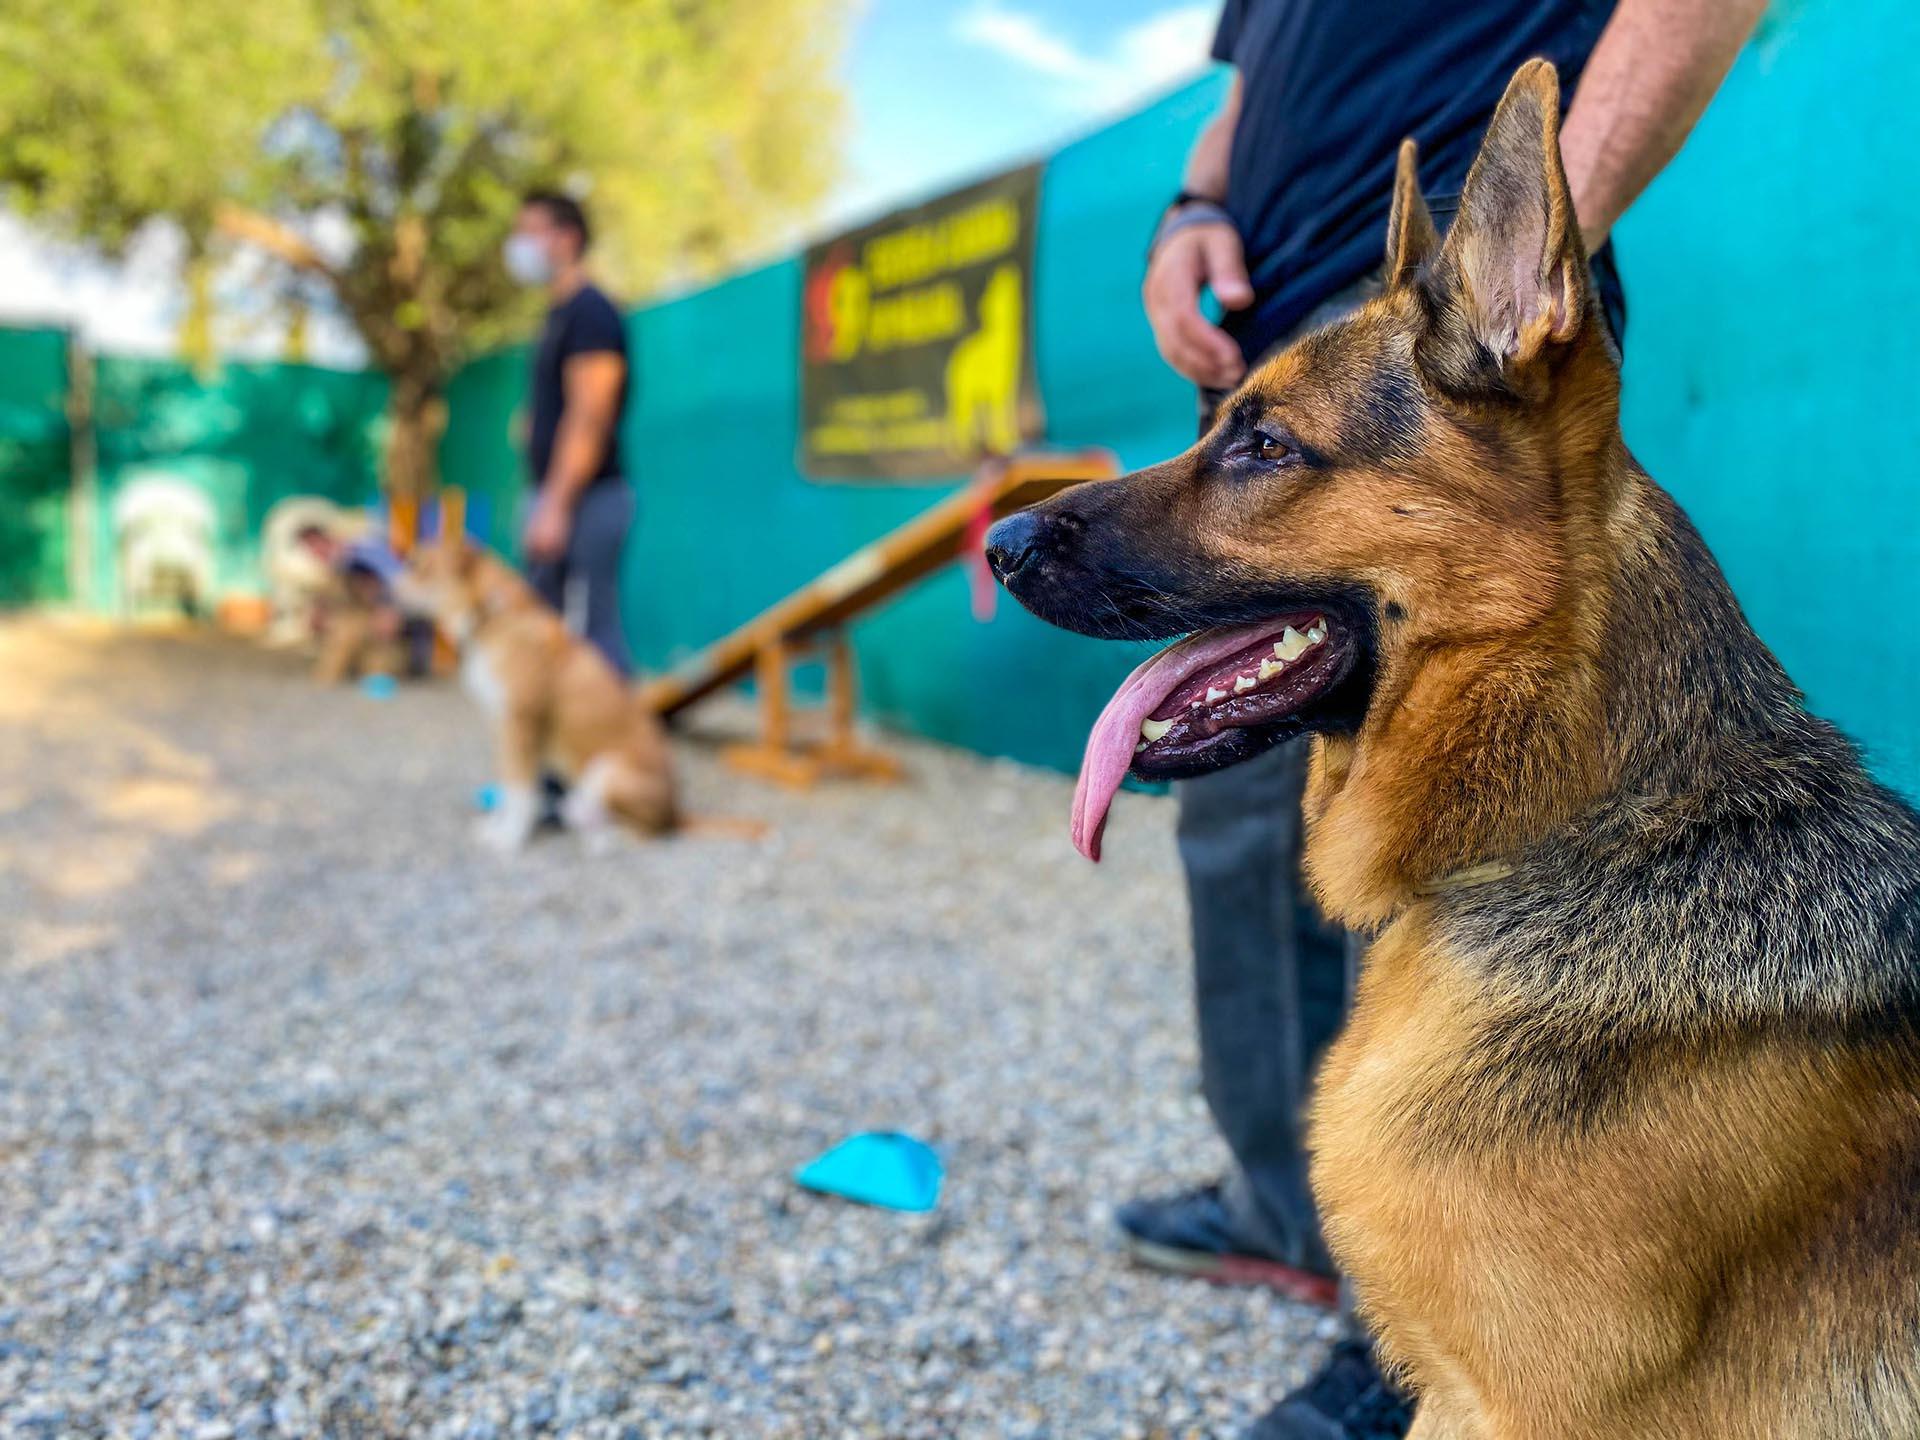 Curso Adiestrador Canino Profesional impartido por K9 Málaga. Acreditado por ANACP mediante Resolución ACACP 1434/2020